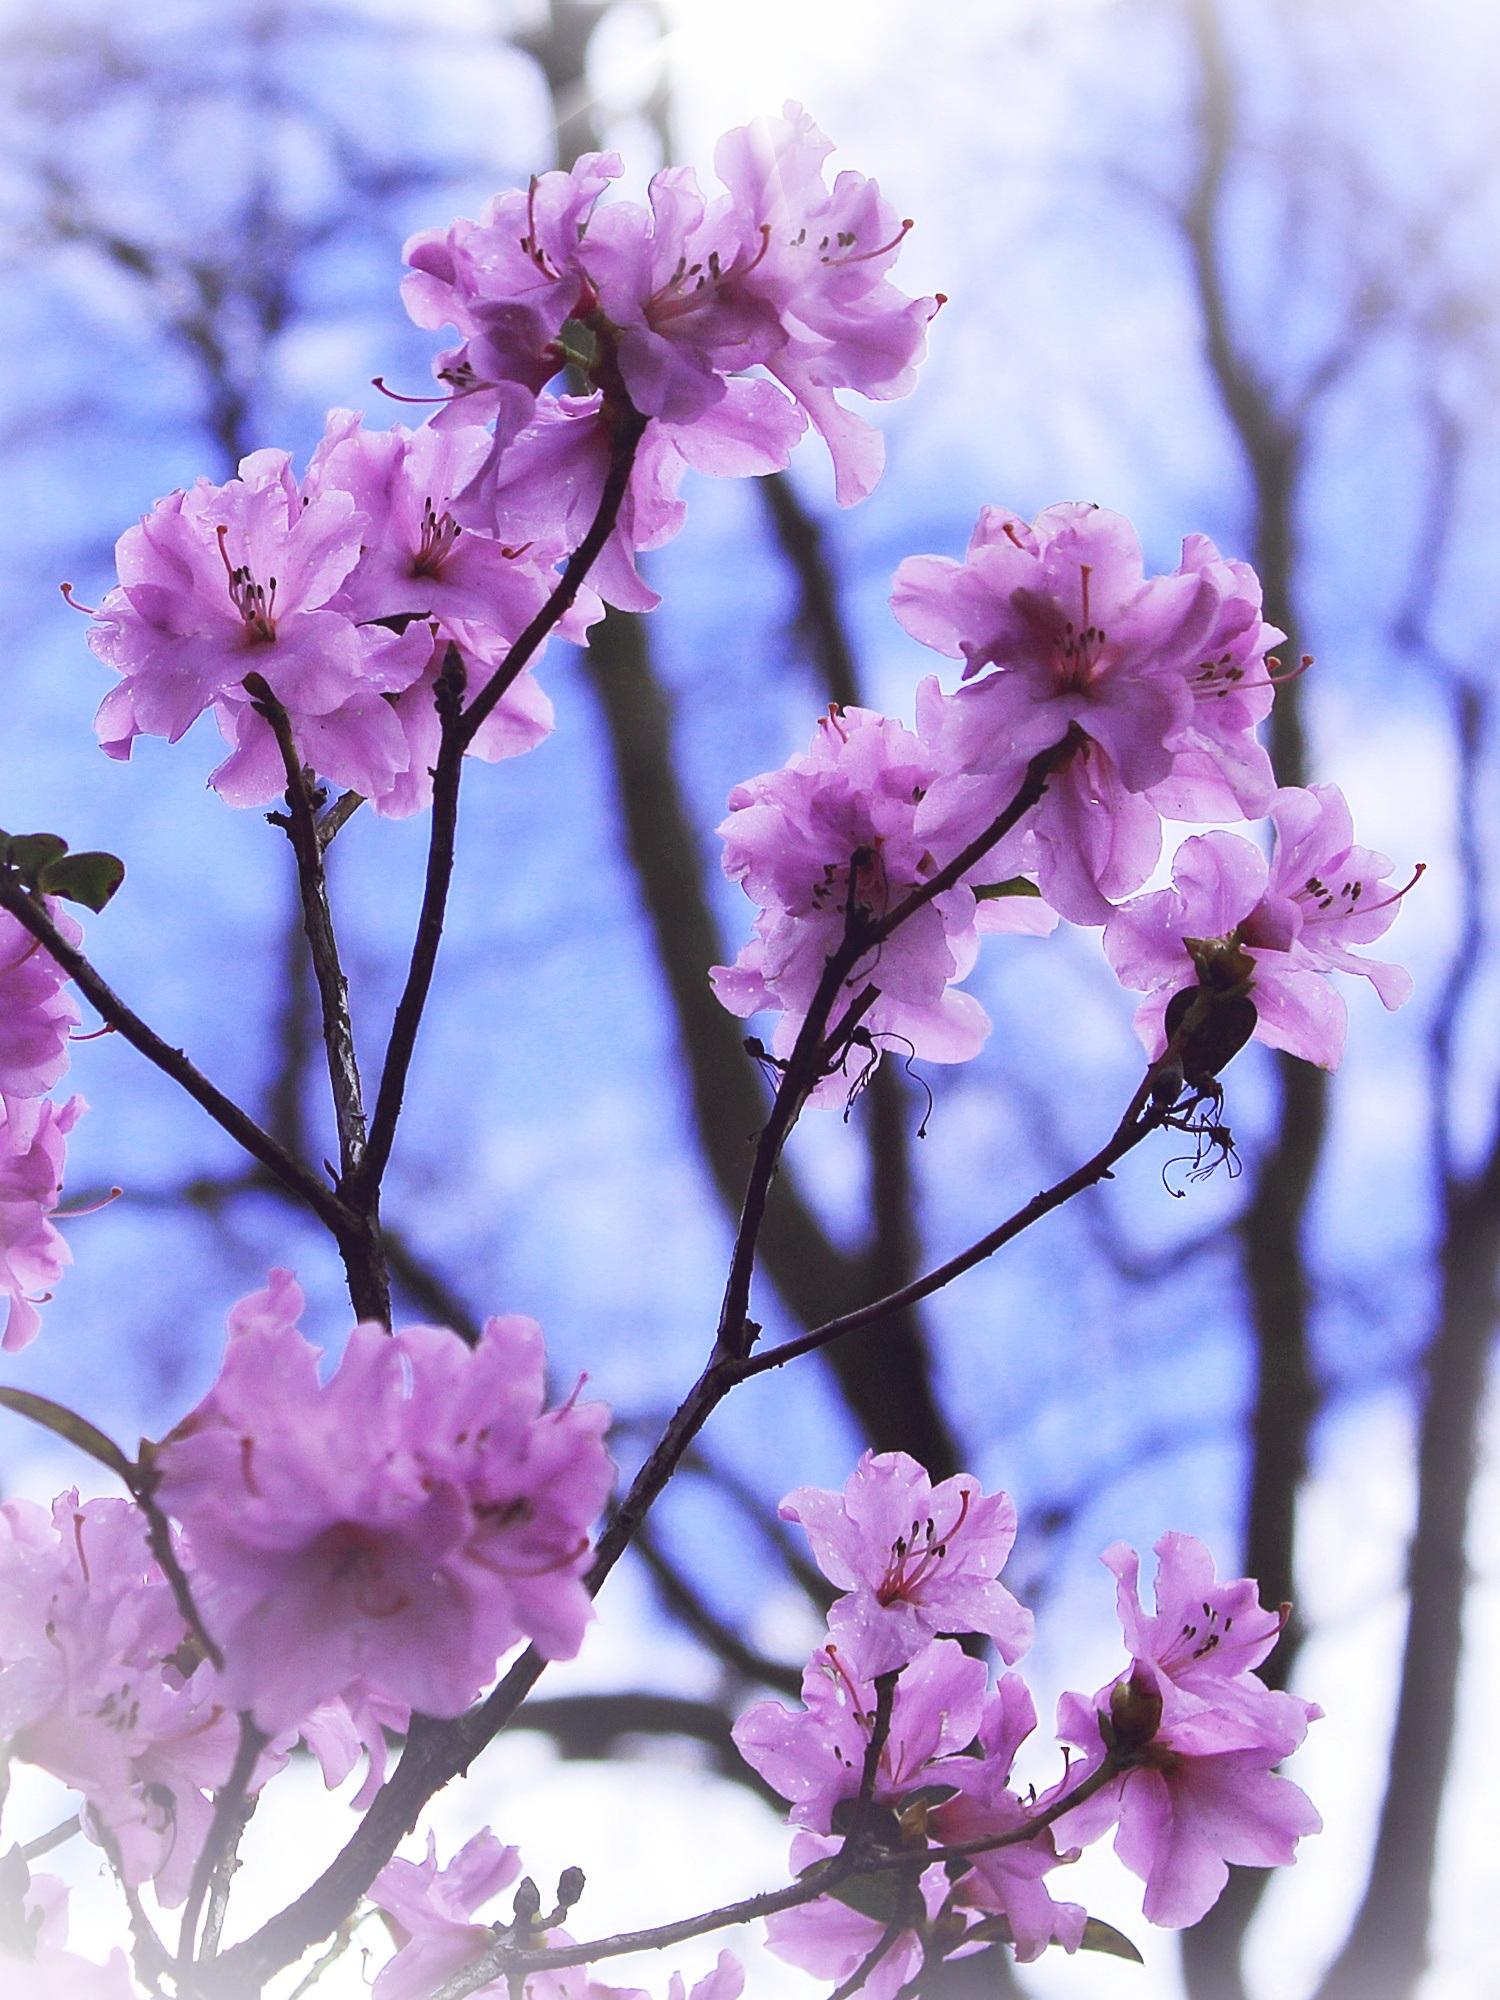 Free Images Nature Branch Sky Sun Flower Petal Bloom Bush